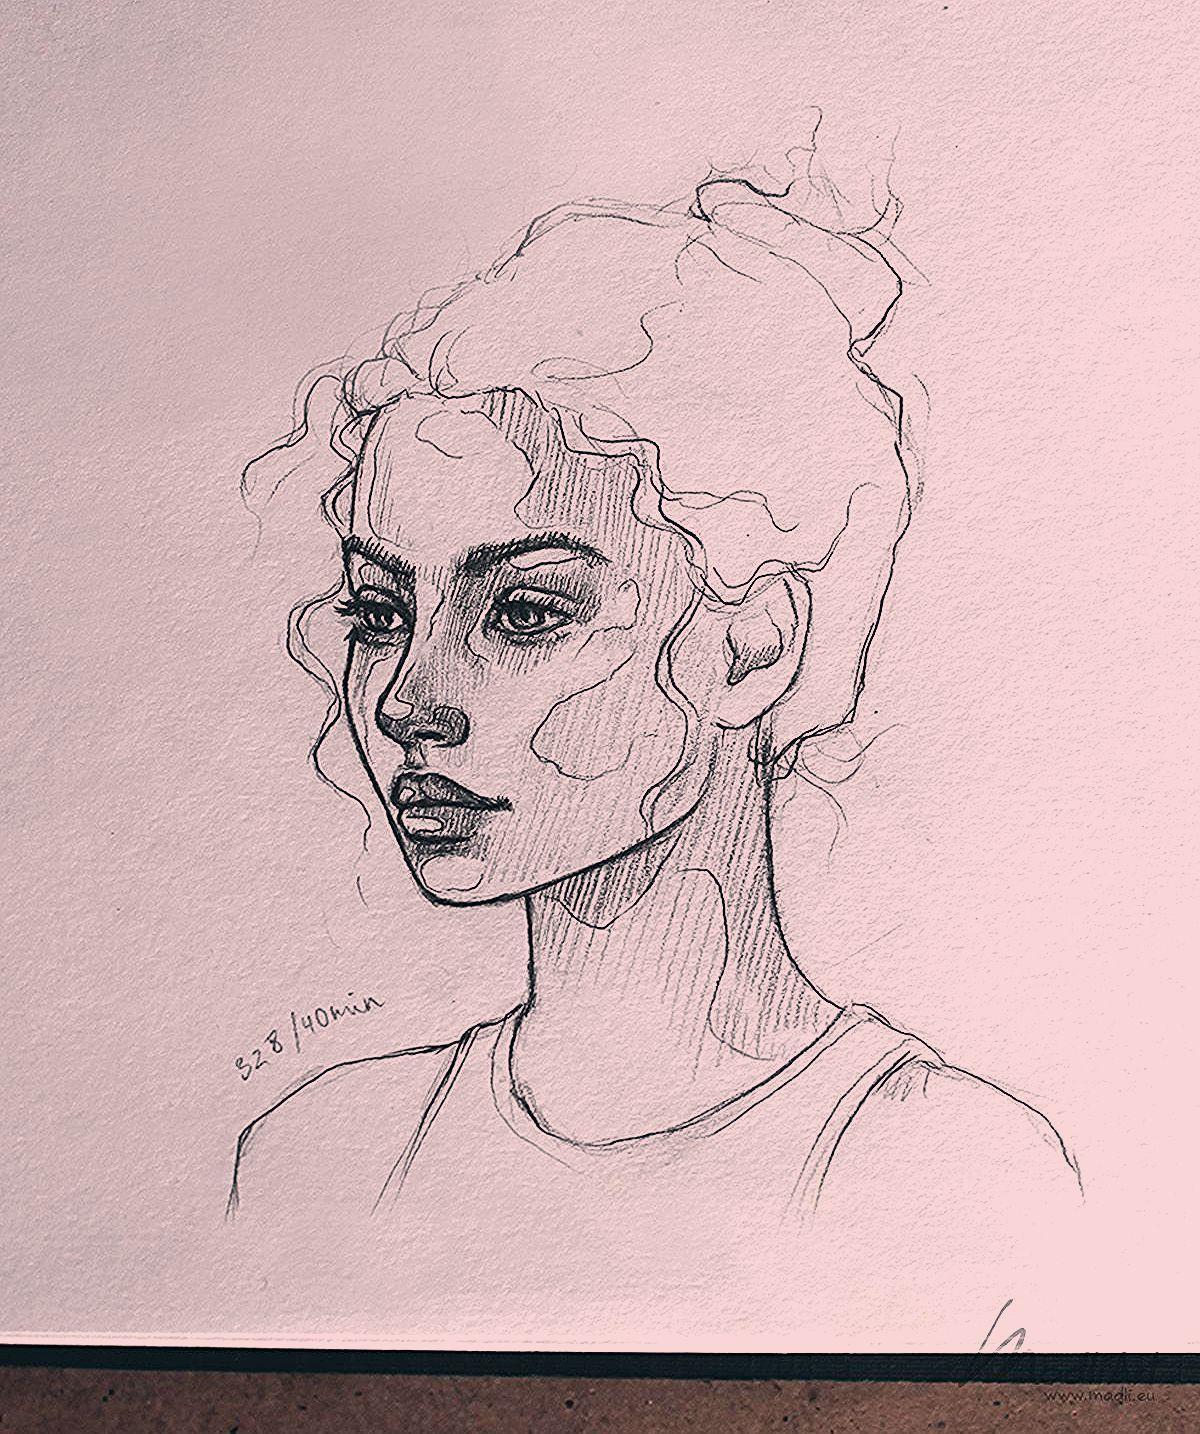 My Sketchbook Art I Drawing Girls I Cute dreamy portrait Sketch of a girl I Drawing poses I Art Ideas I Fantasy Pencil draw doodle I Line Art face Ske…